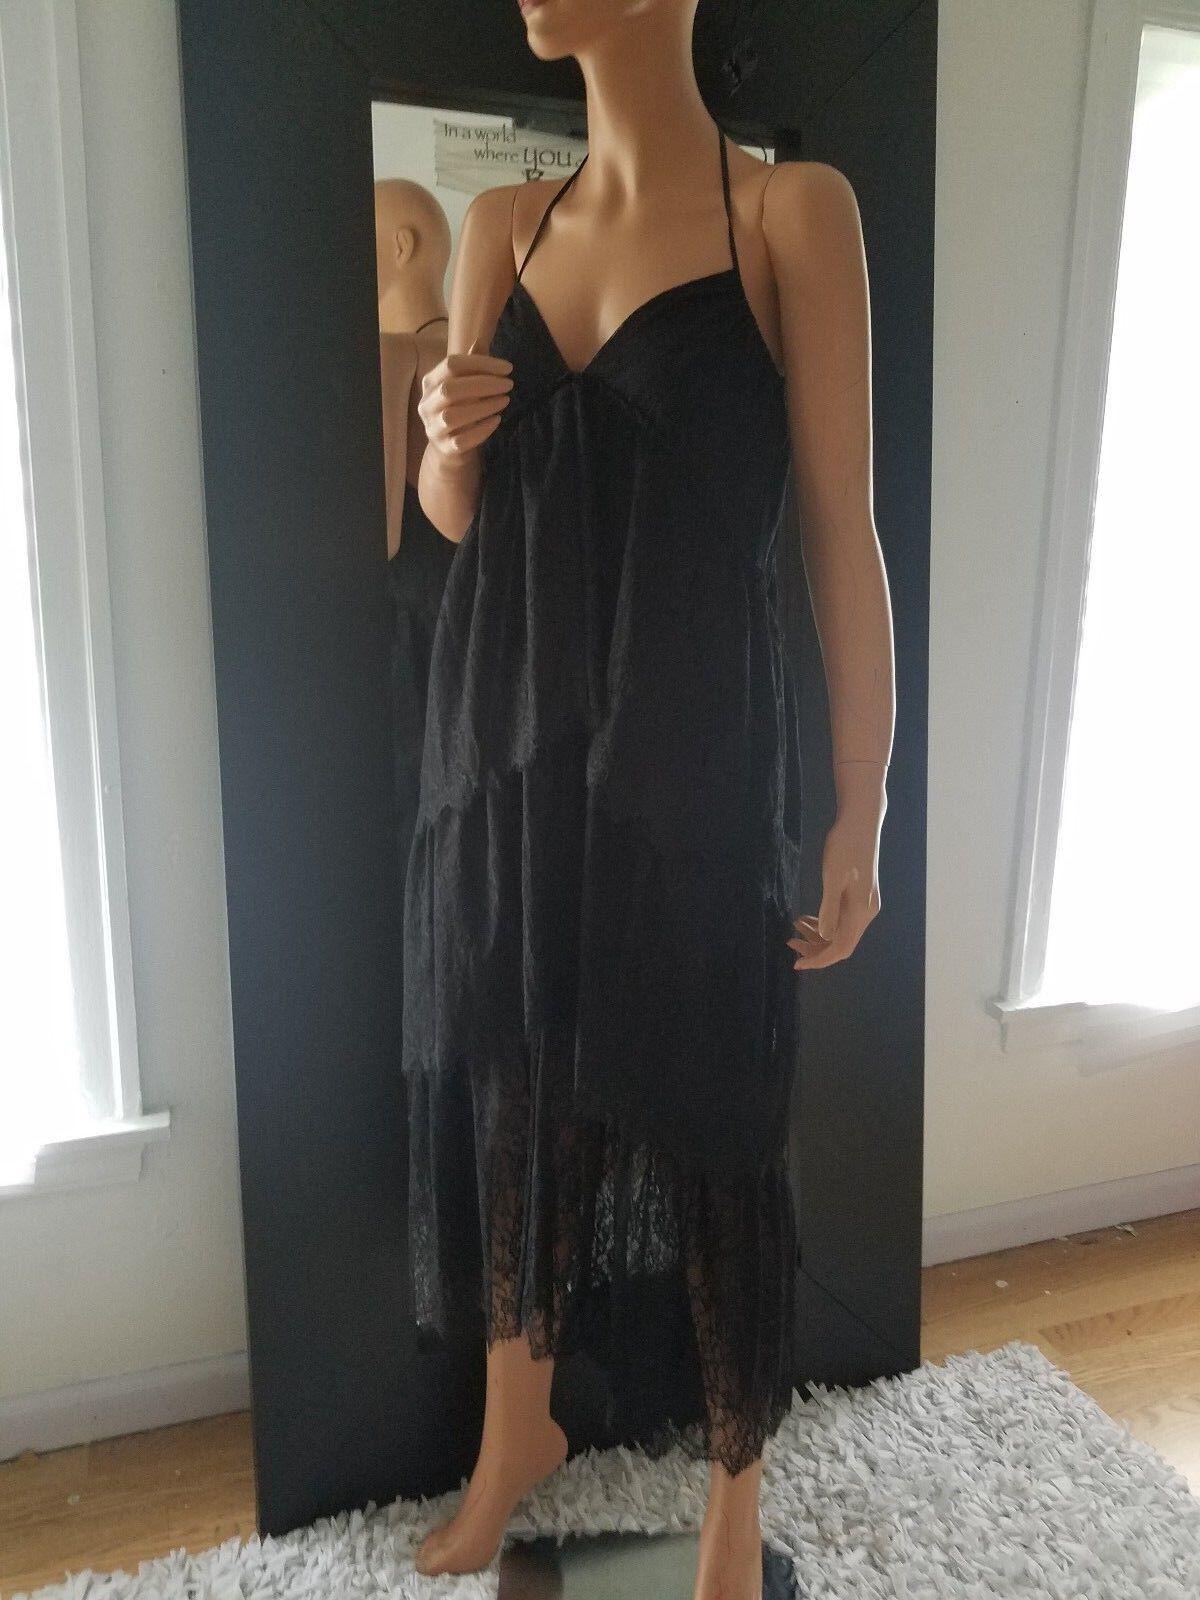 Bcbg schwarz KAT halter dress XS